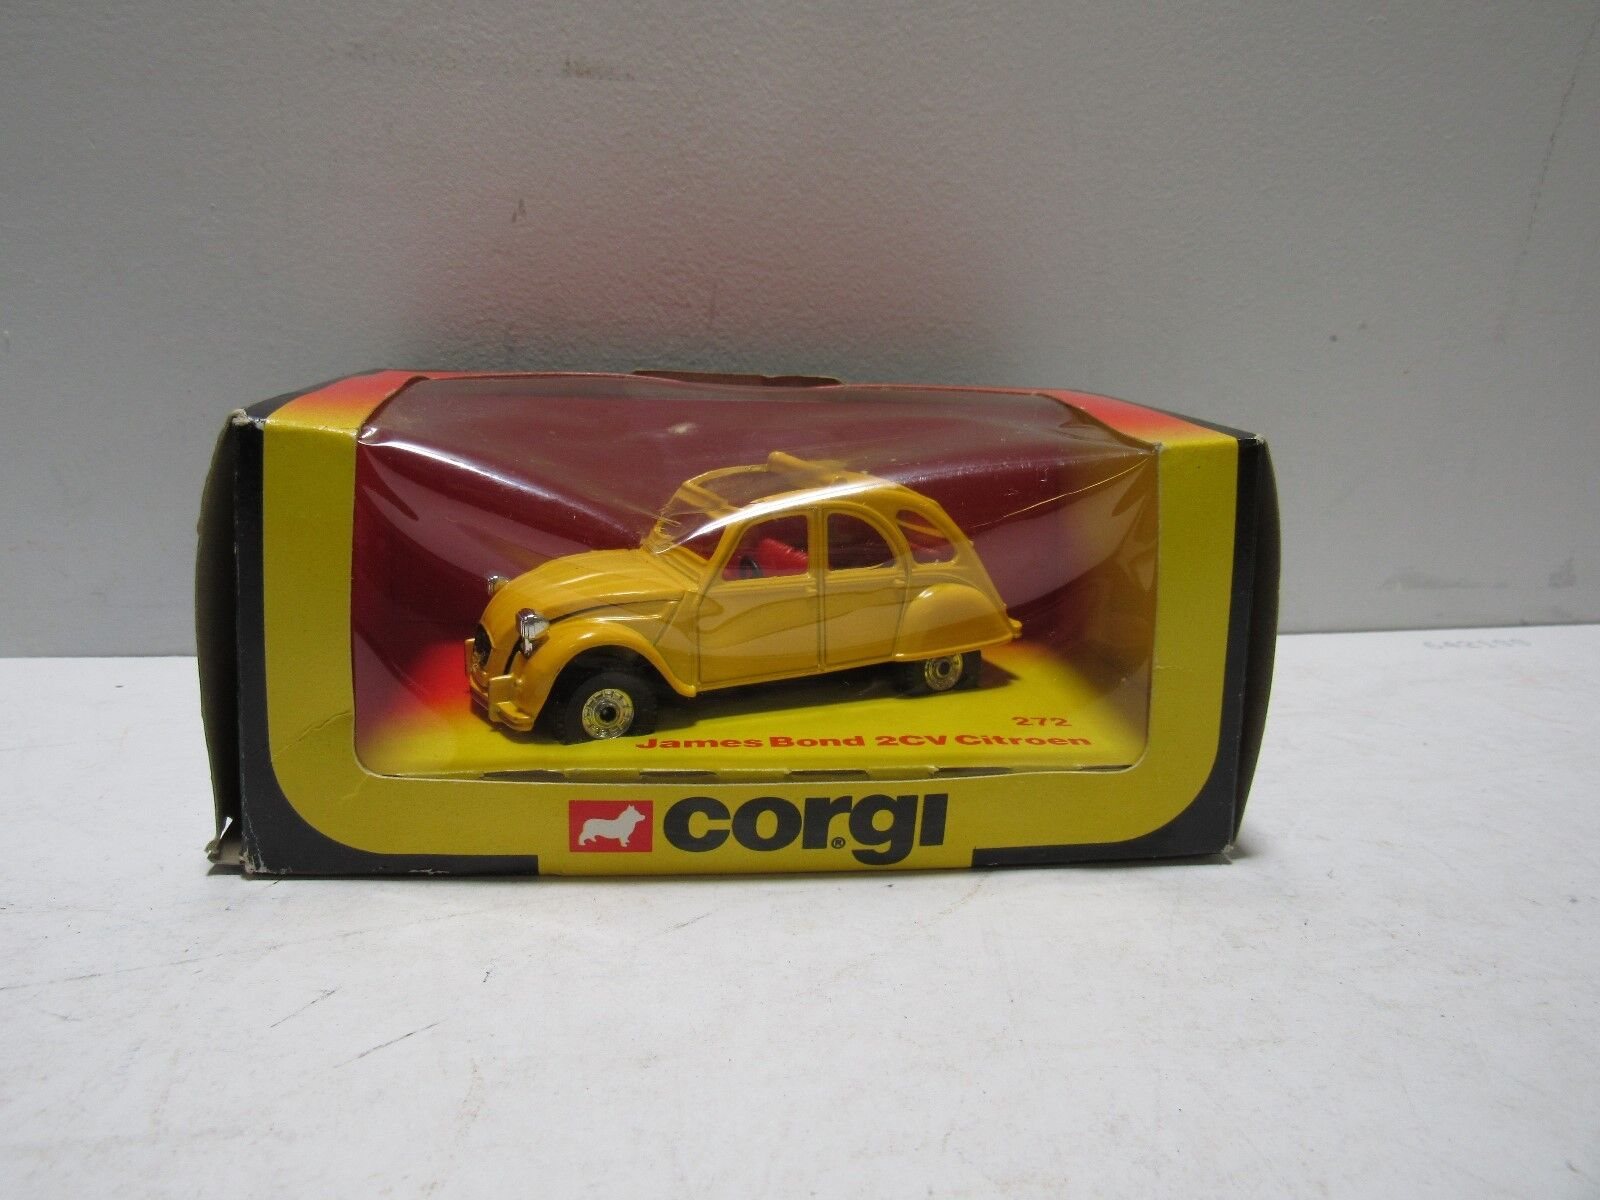 Corgi 272 James Bond 2CV Citroen New In Box